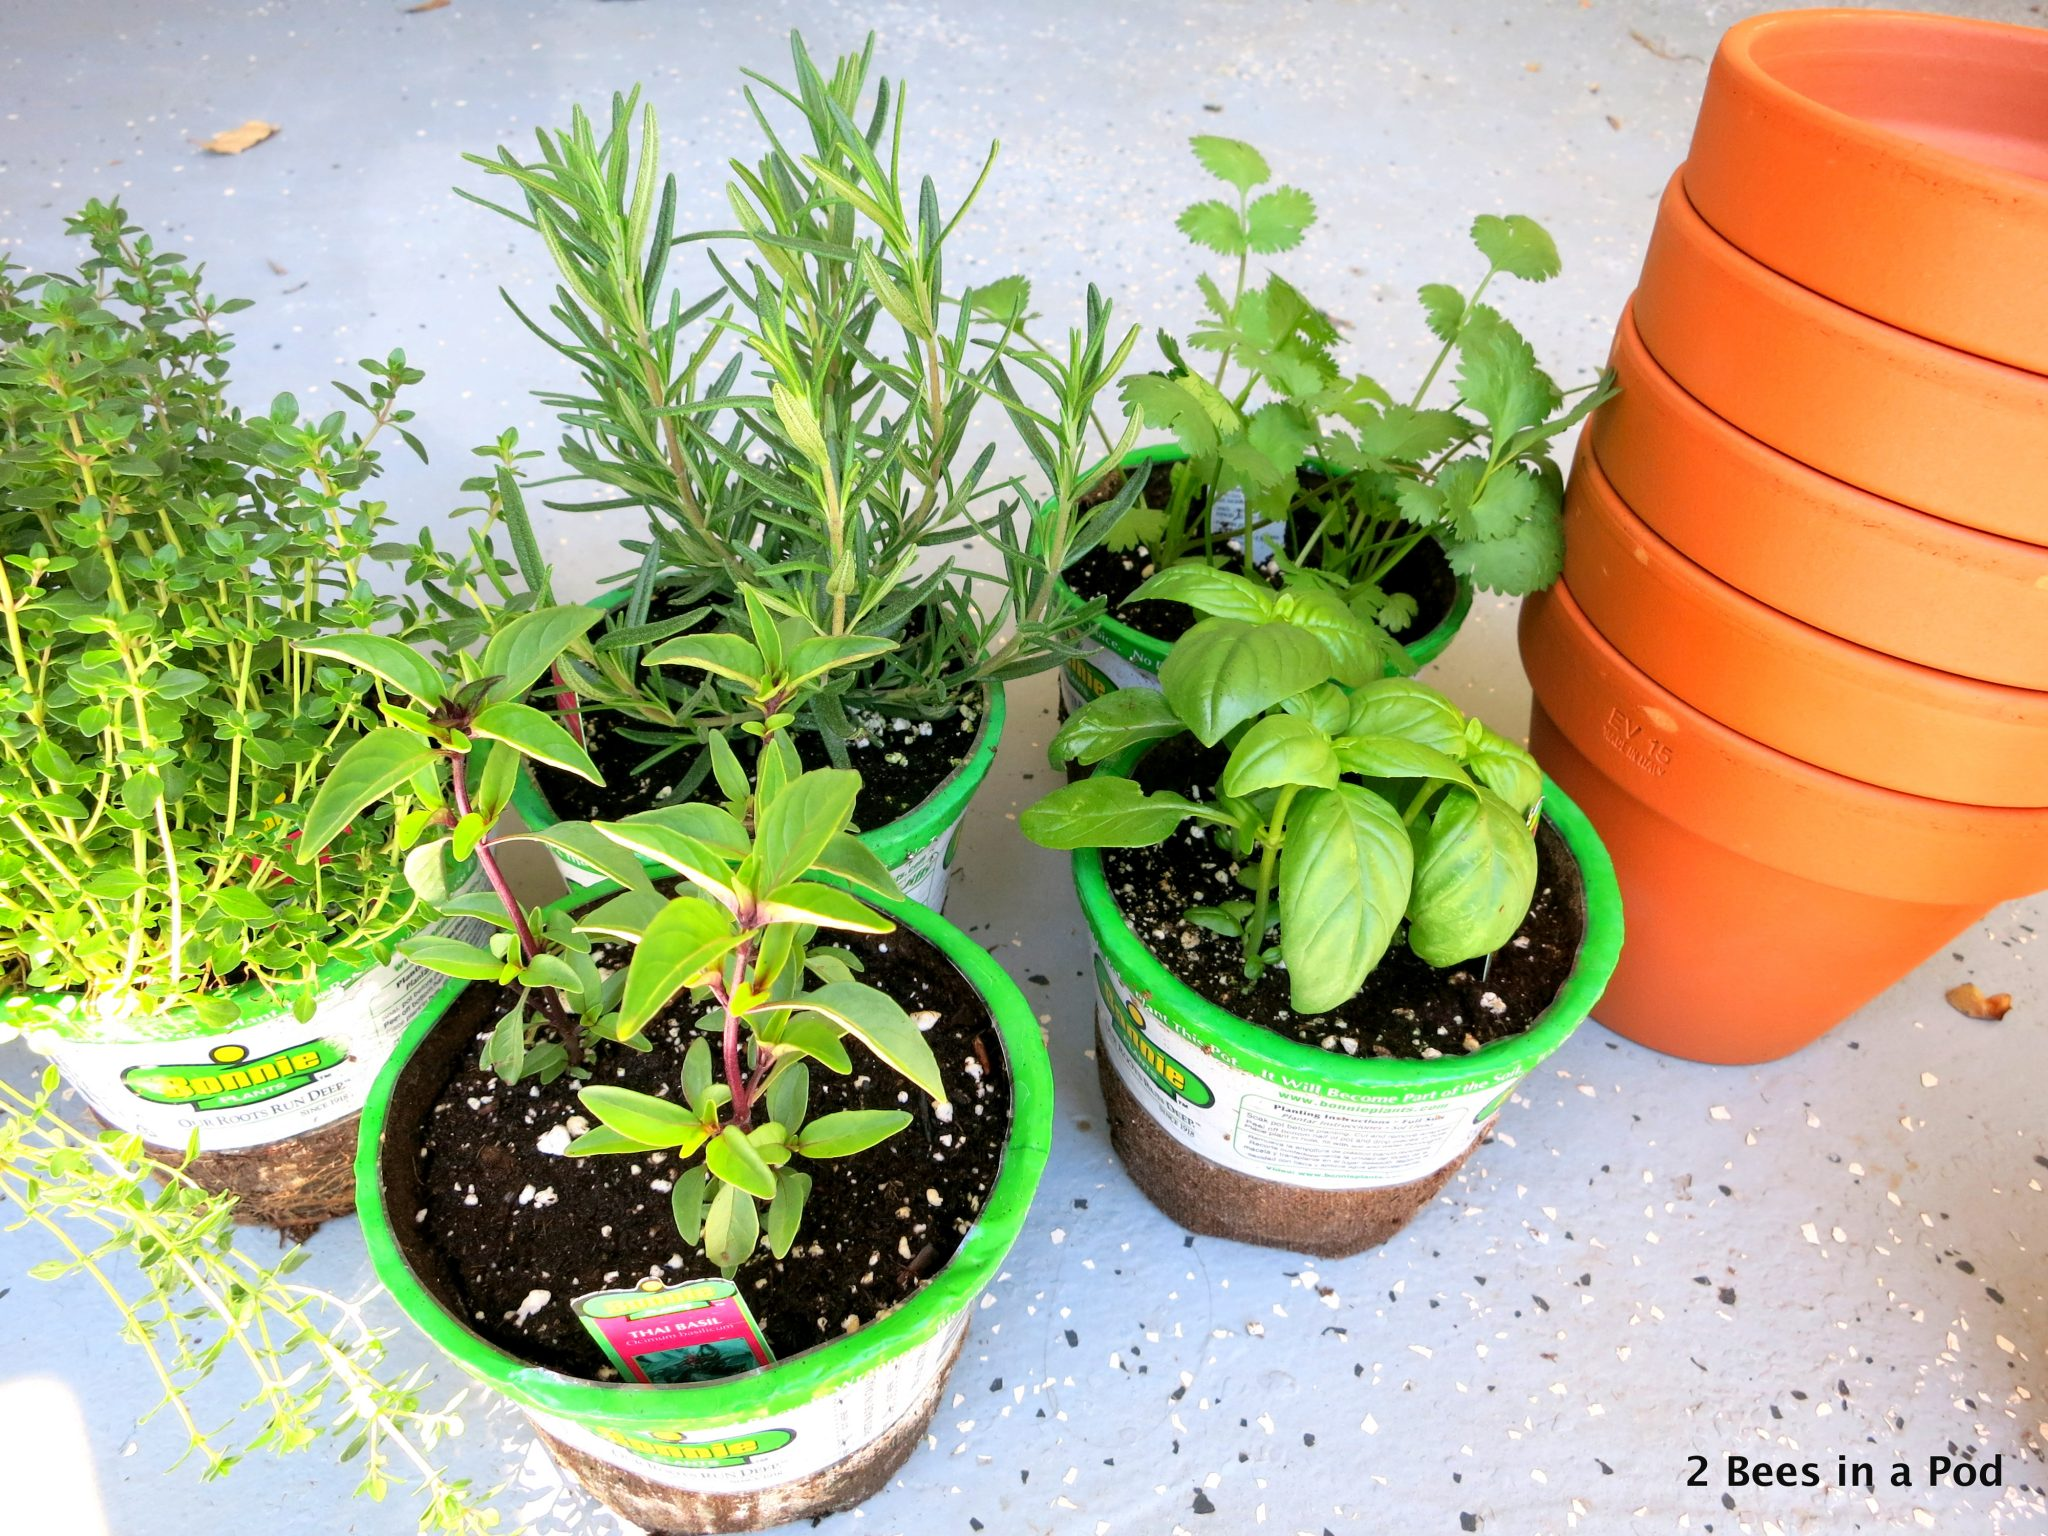 herbs & terracotta #springtime #gardening